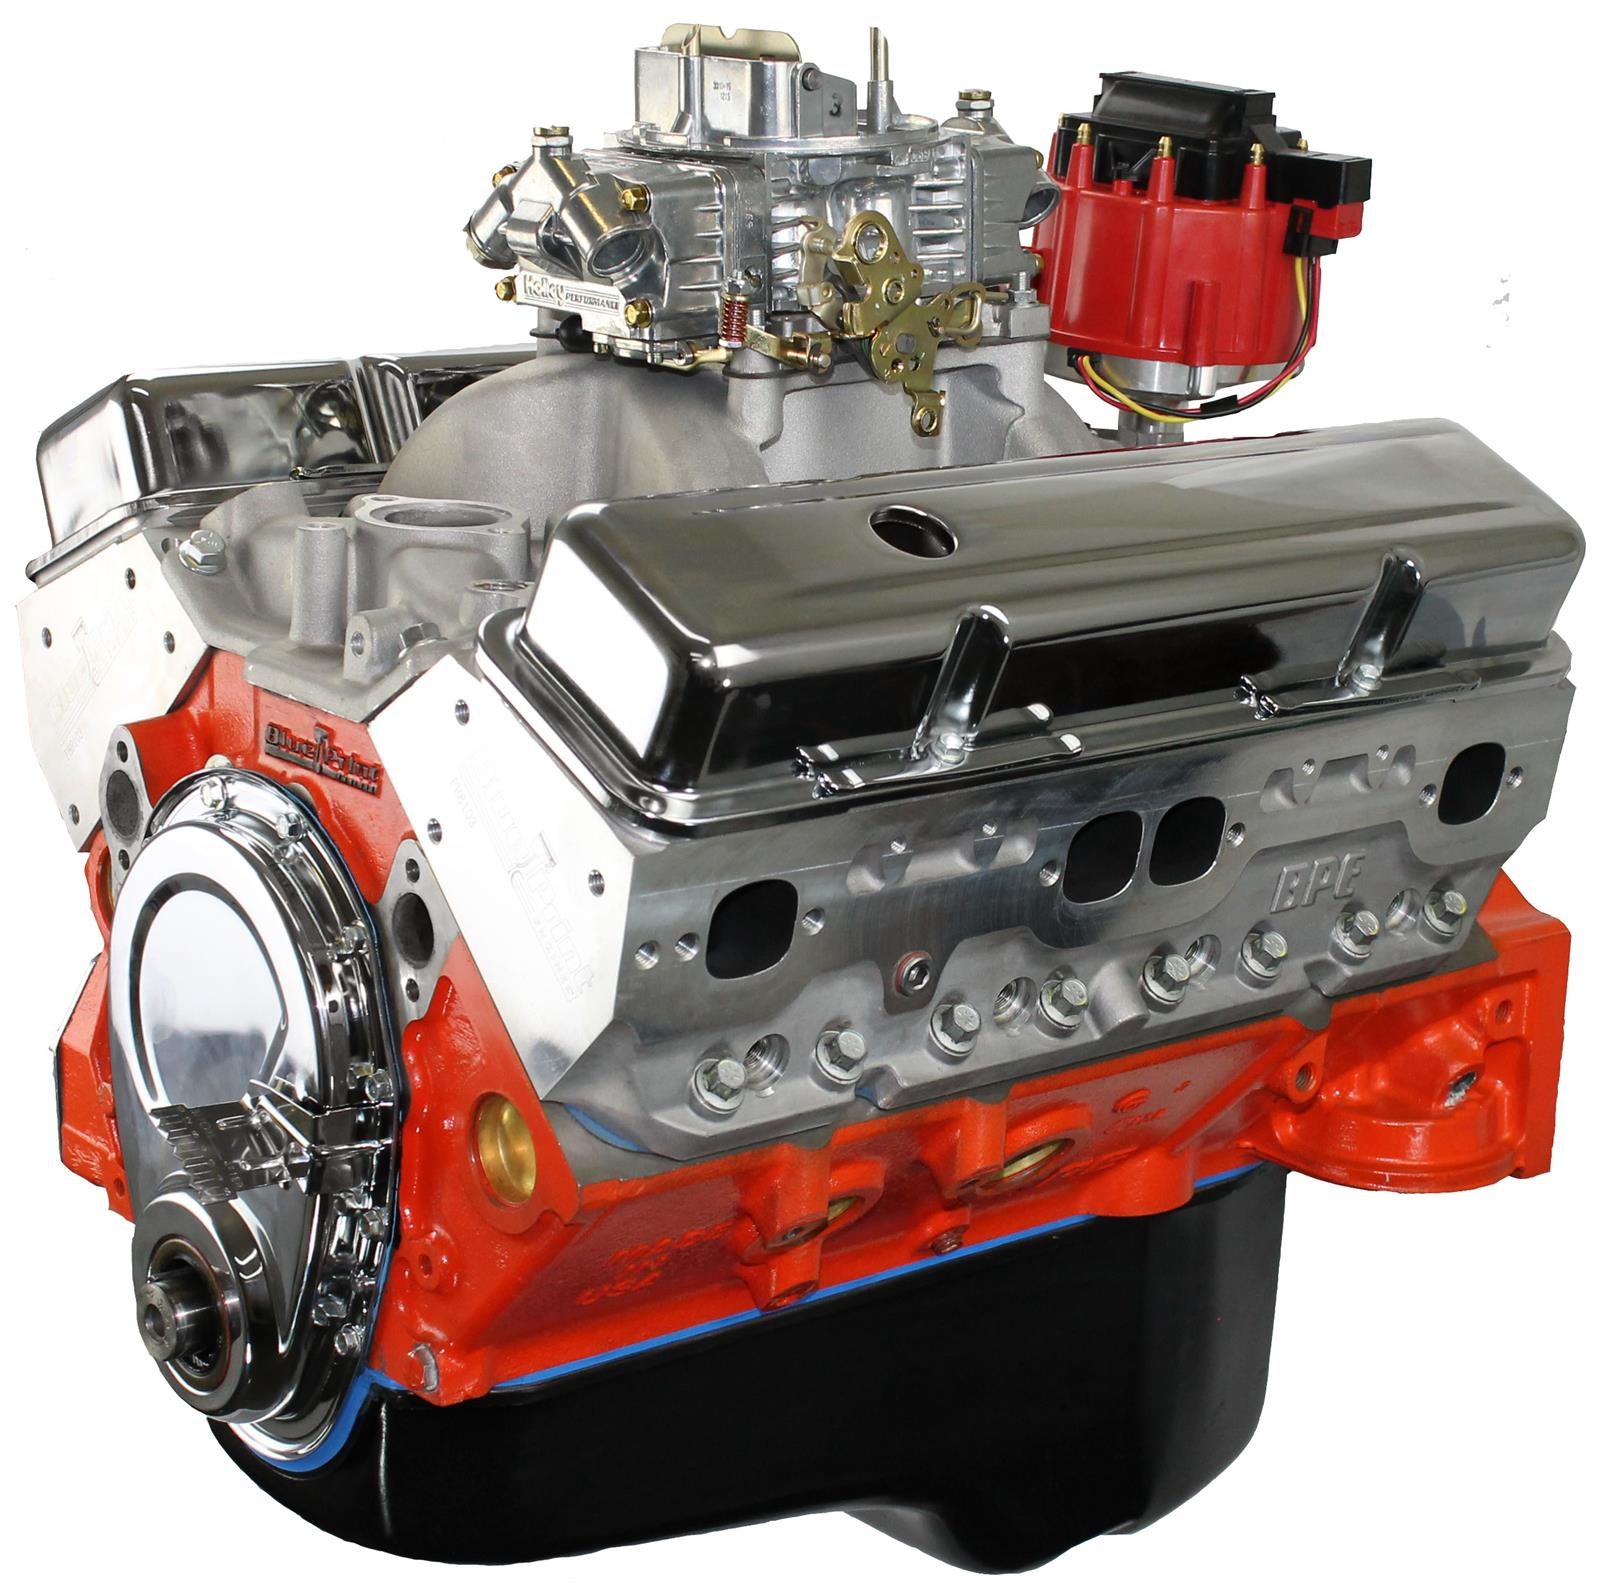 Blueprint Engines To Showcase New Chevrolet 400 Engine